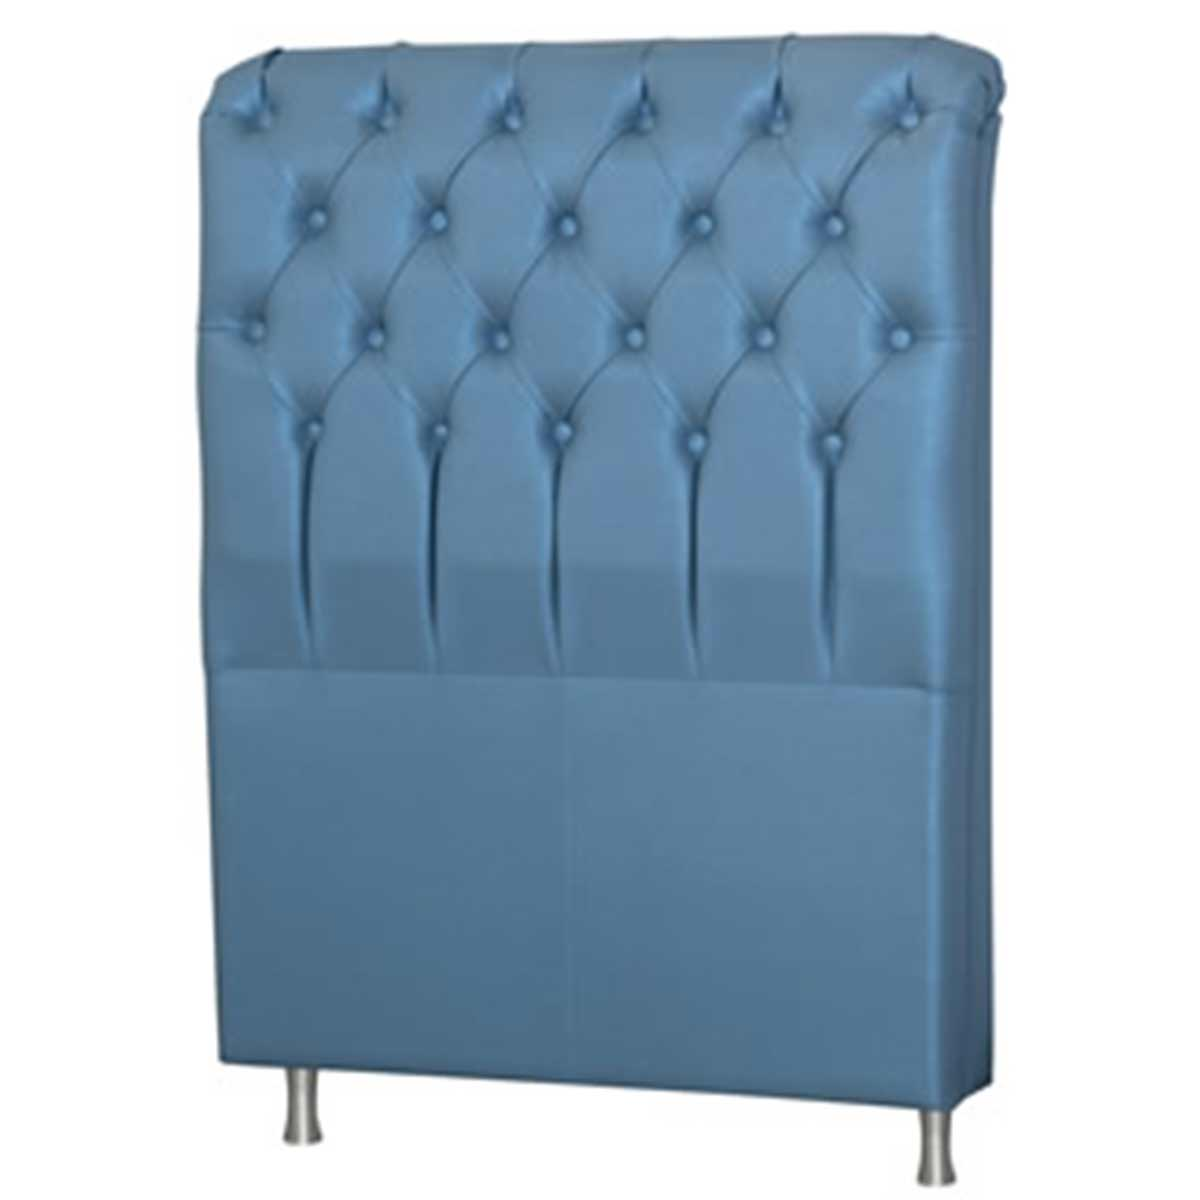 Cabeceira Domus King 195 cm Corino Metalizado Azul Perfan